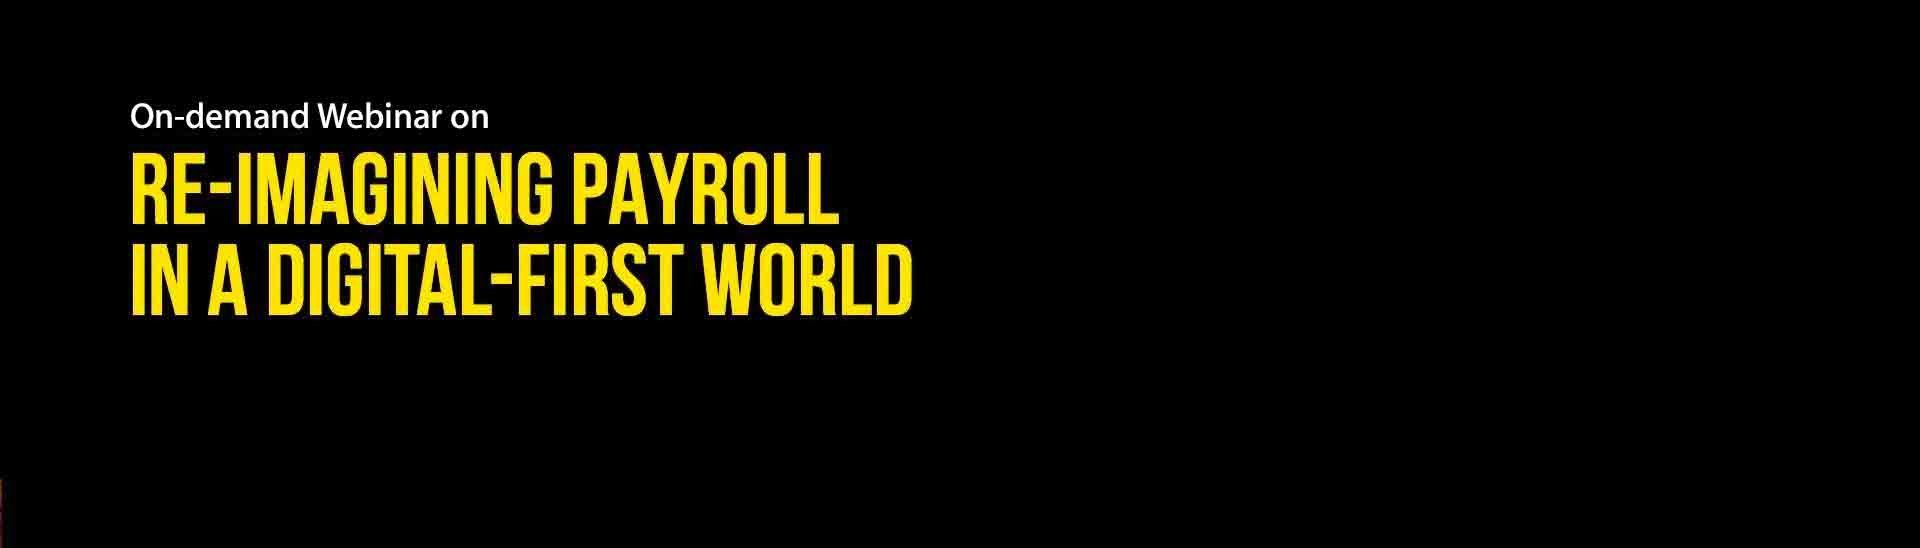 RE_Imagining-Payroll_-new-1.jpg